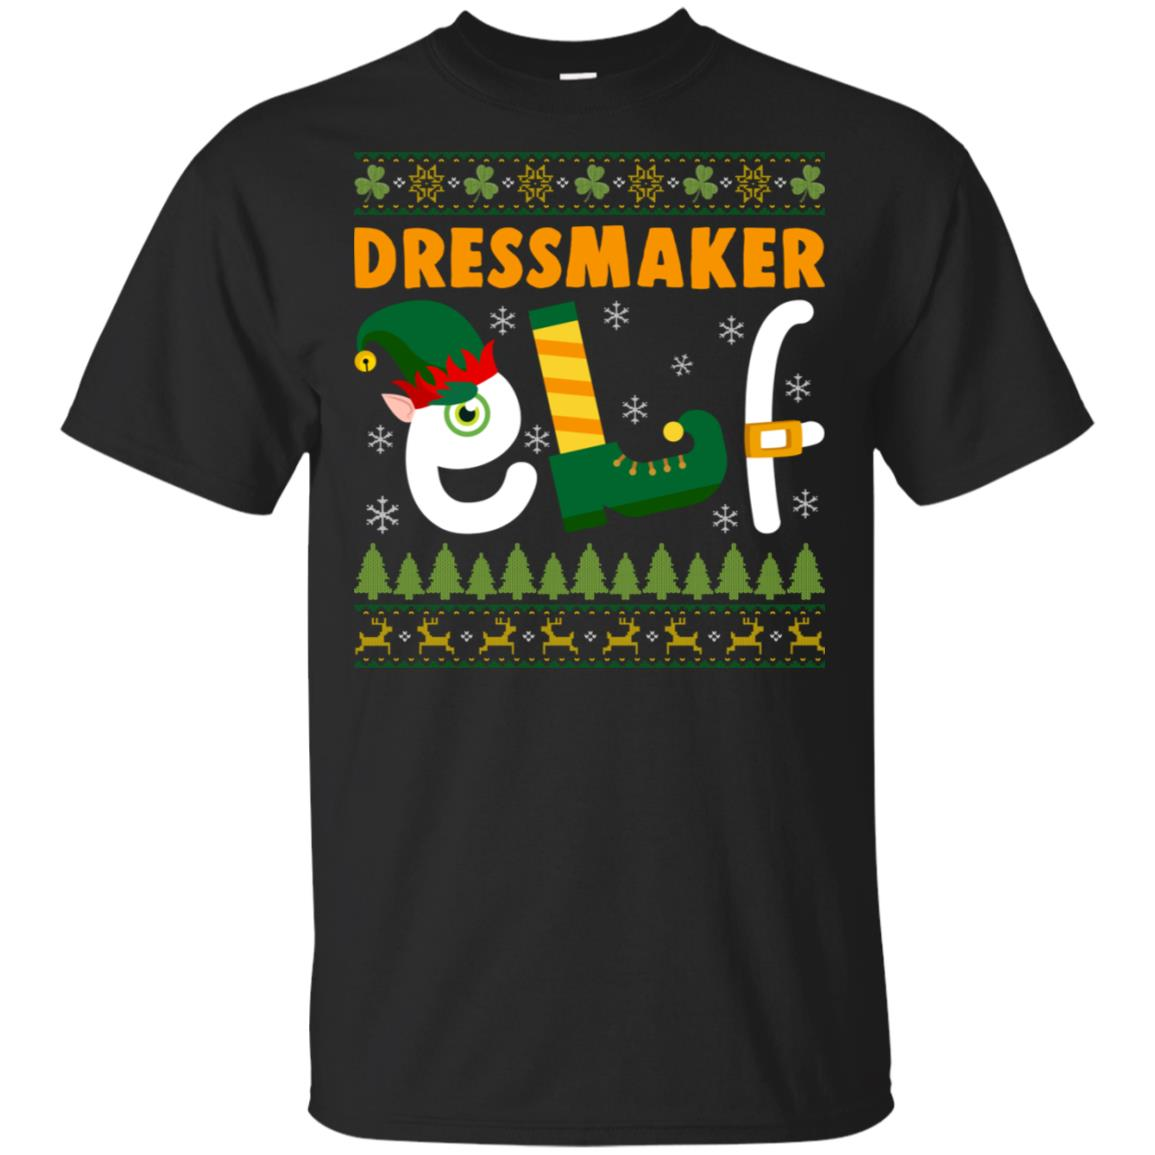 Dressmaker Elf Unisex Short Sleeve